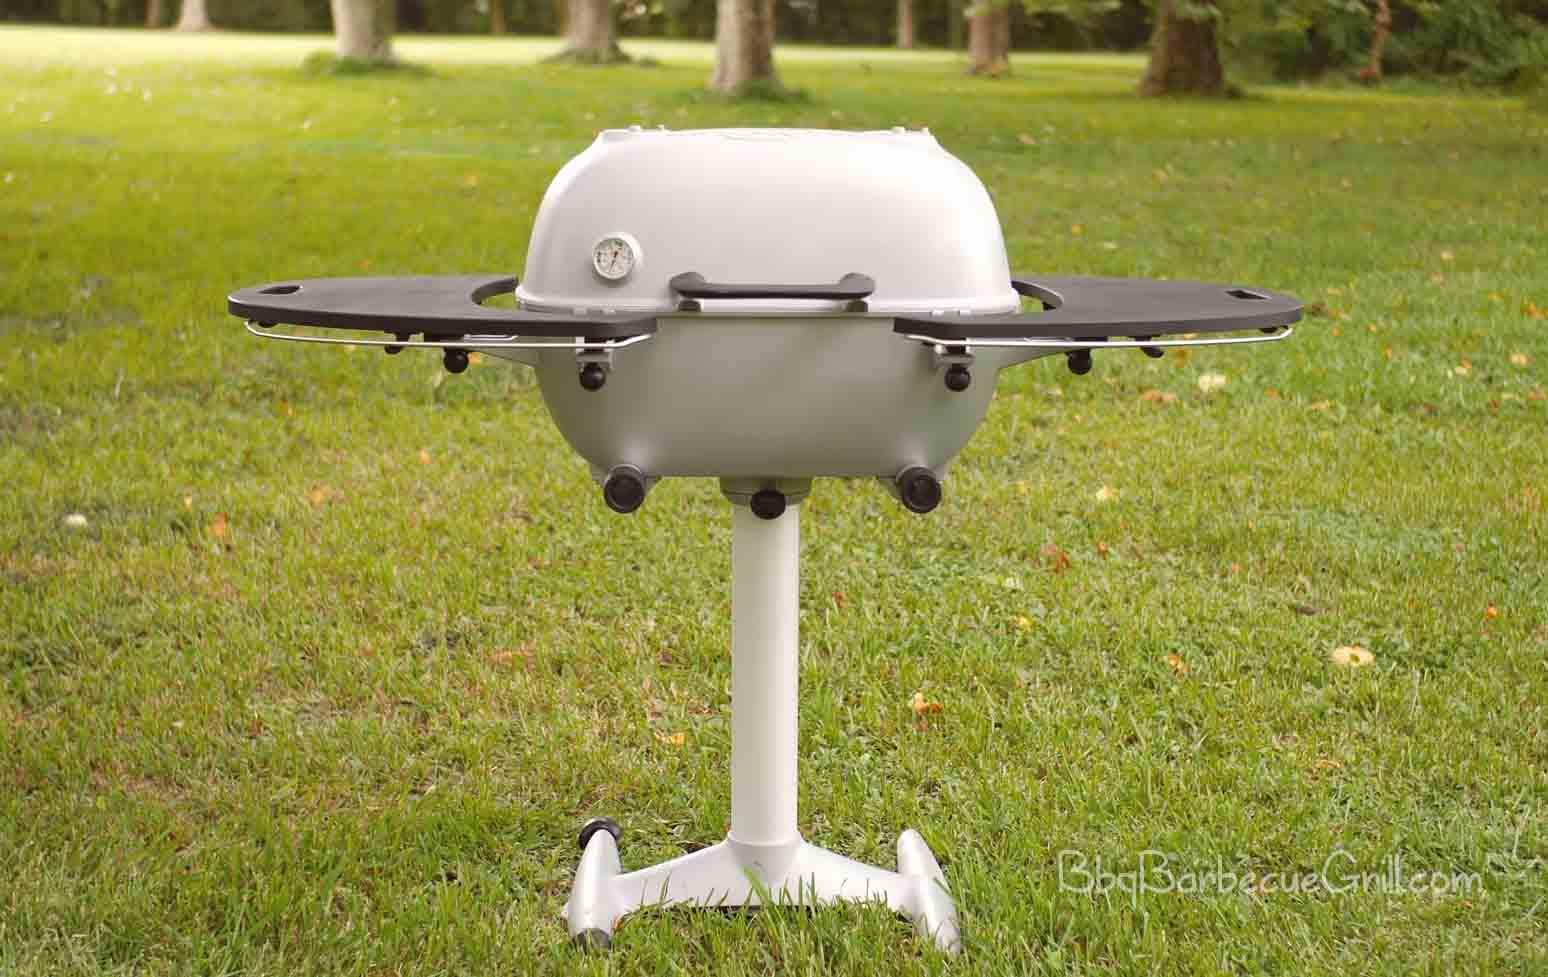 Best aluminum charcoal grill